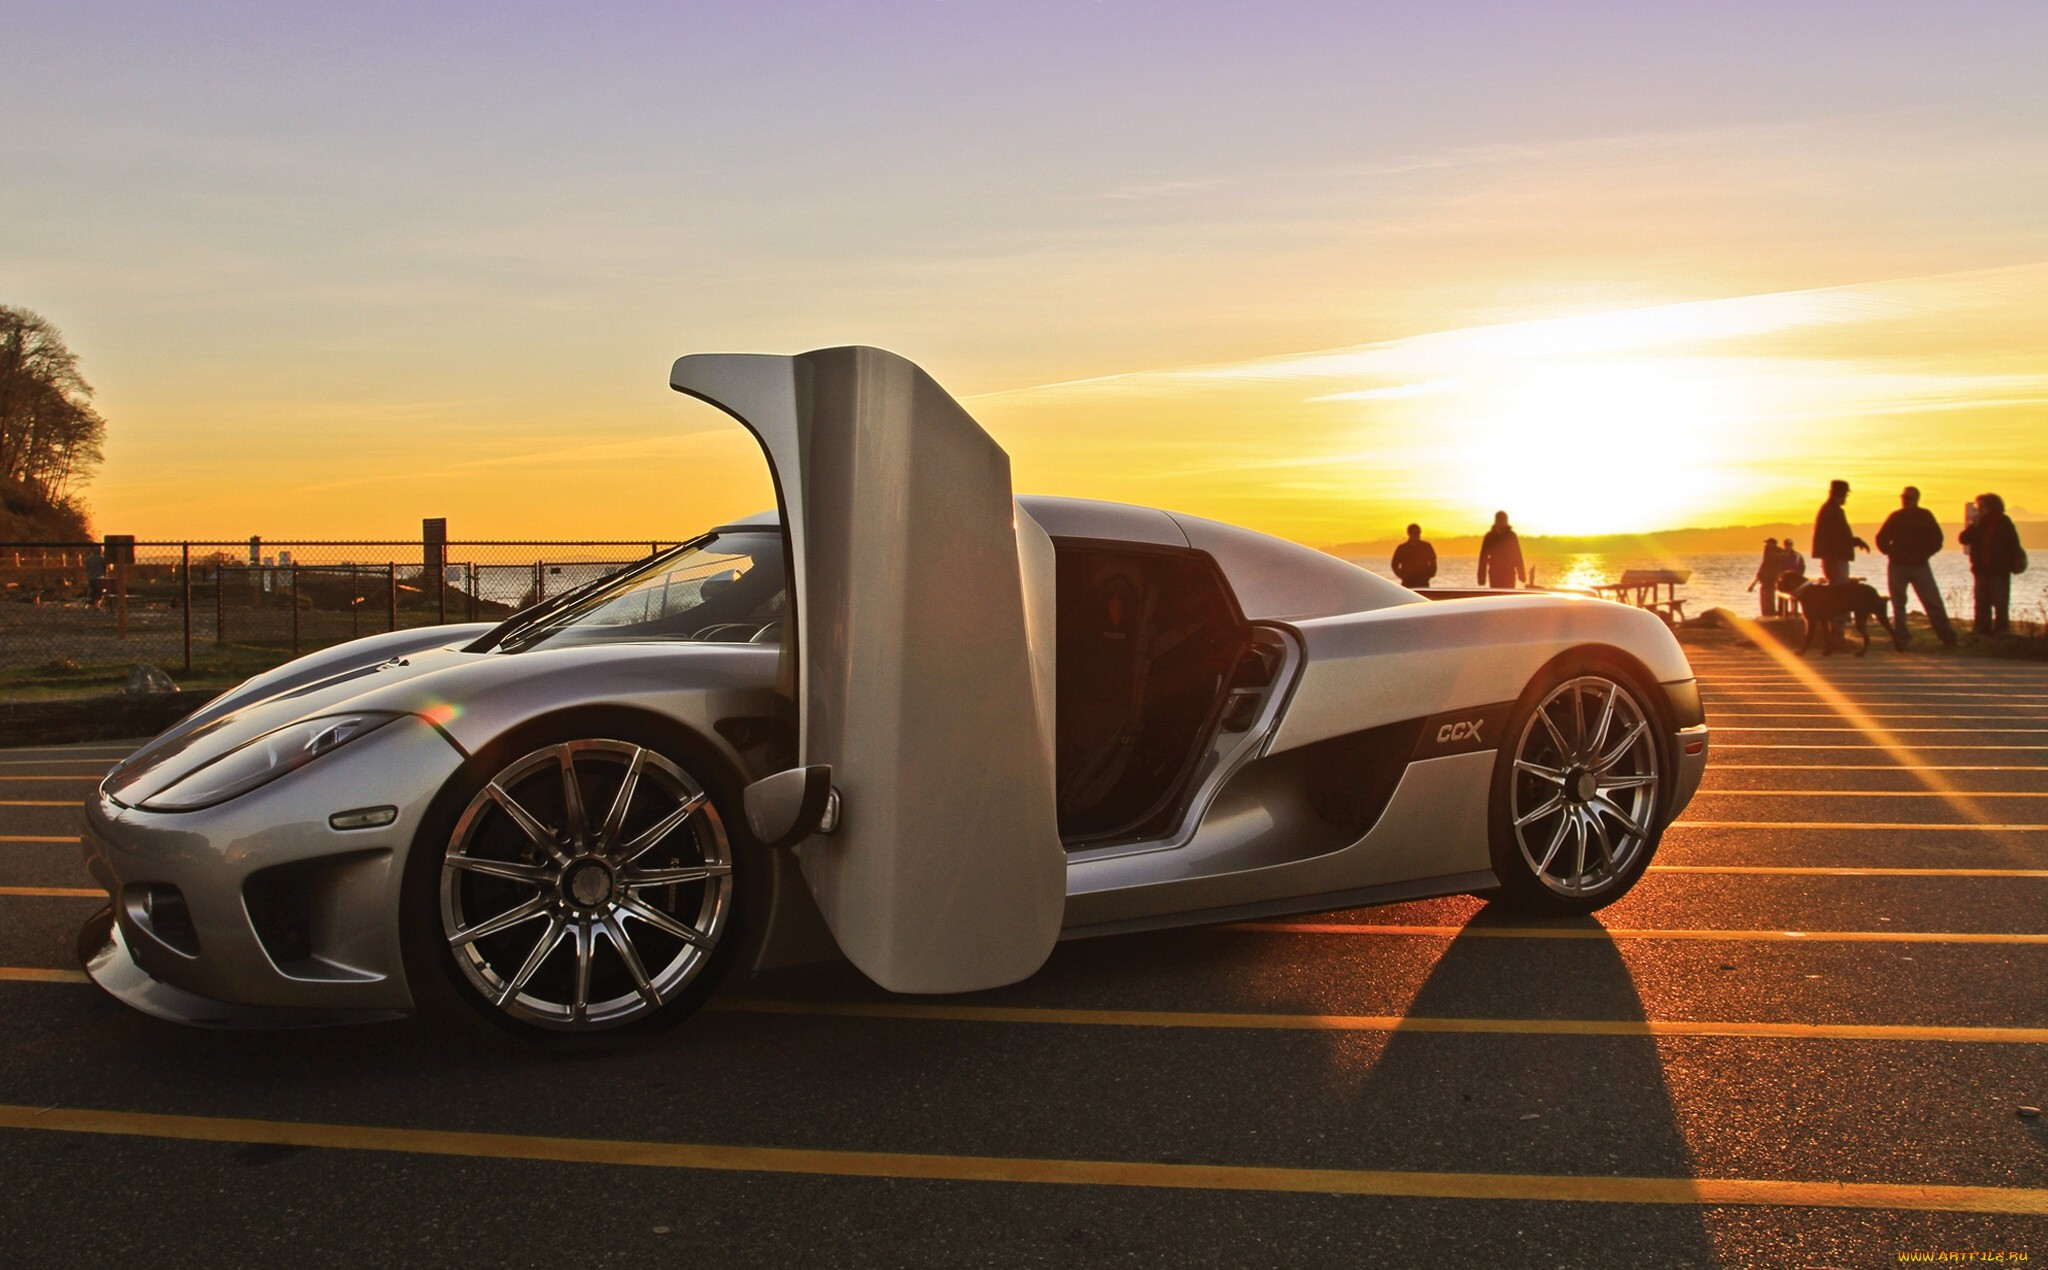 Koenigsegg Ccx Supercar Silver Wallpaper